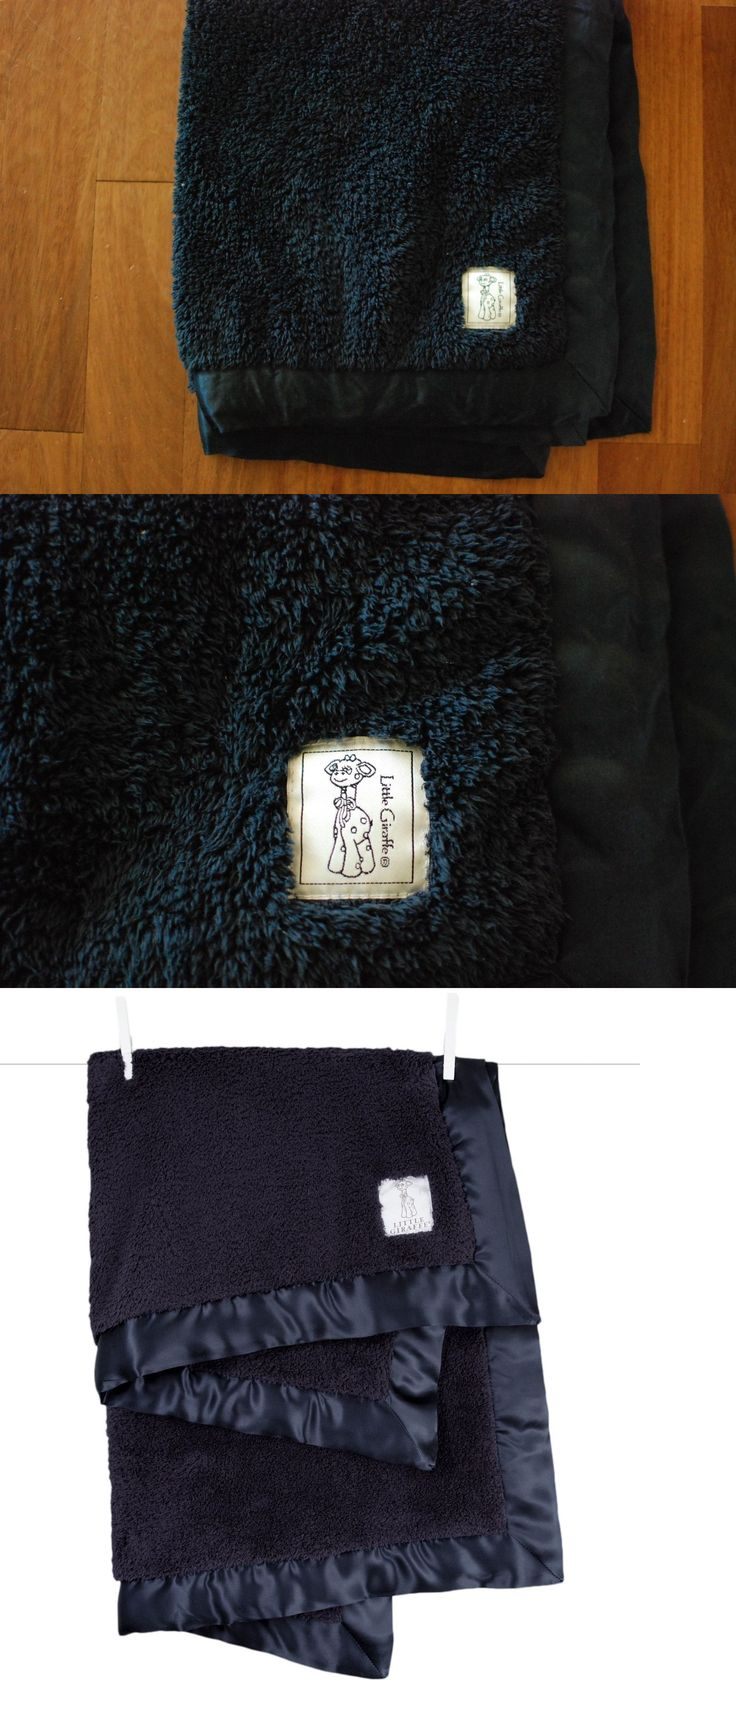 Blankets and Throws 3081: Little Giraffe Blue Chenille Stroller Blanket Baby Gift 29X35 Nwot -> BUY IT NOW ONLY: $38 on eBay!